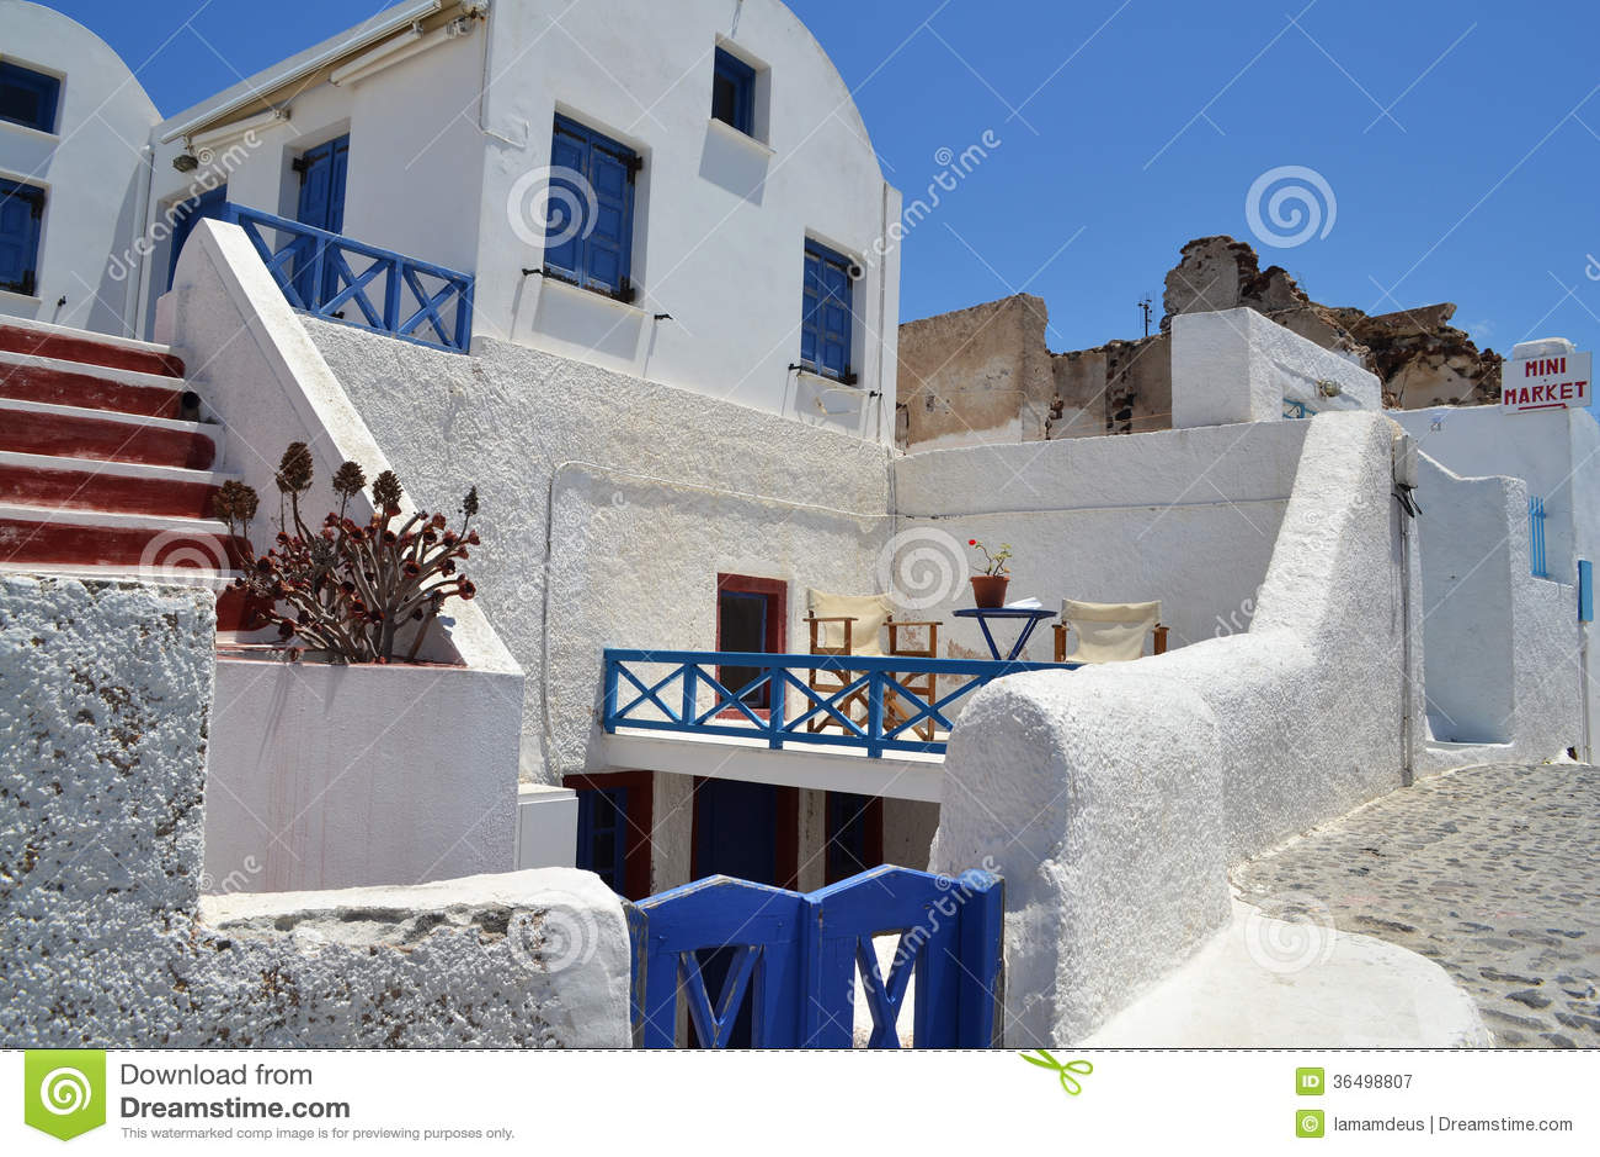 white house santorini - photo #27